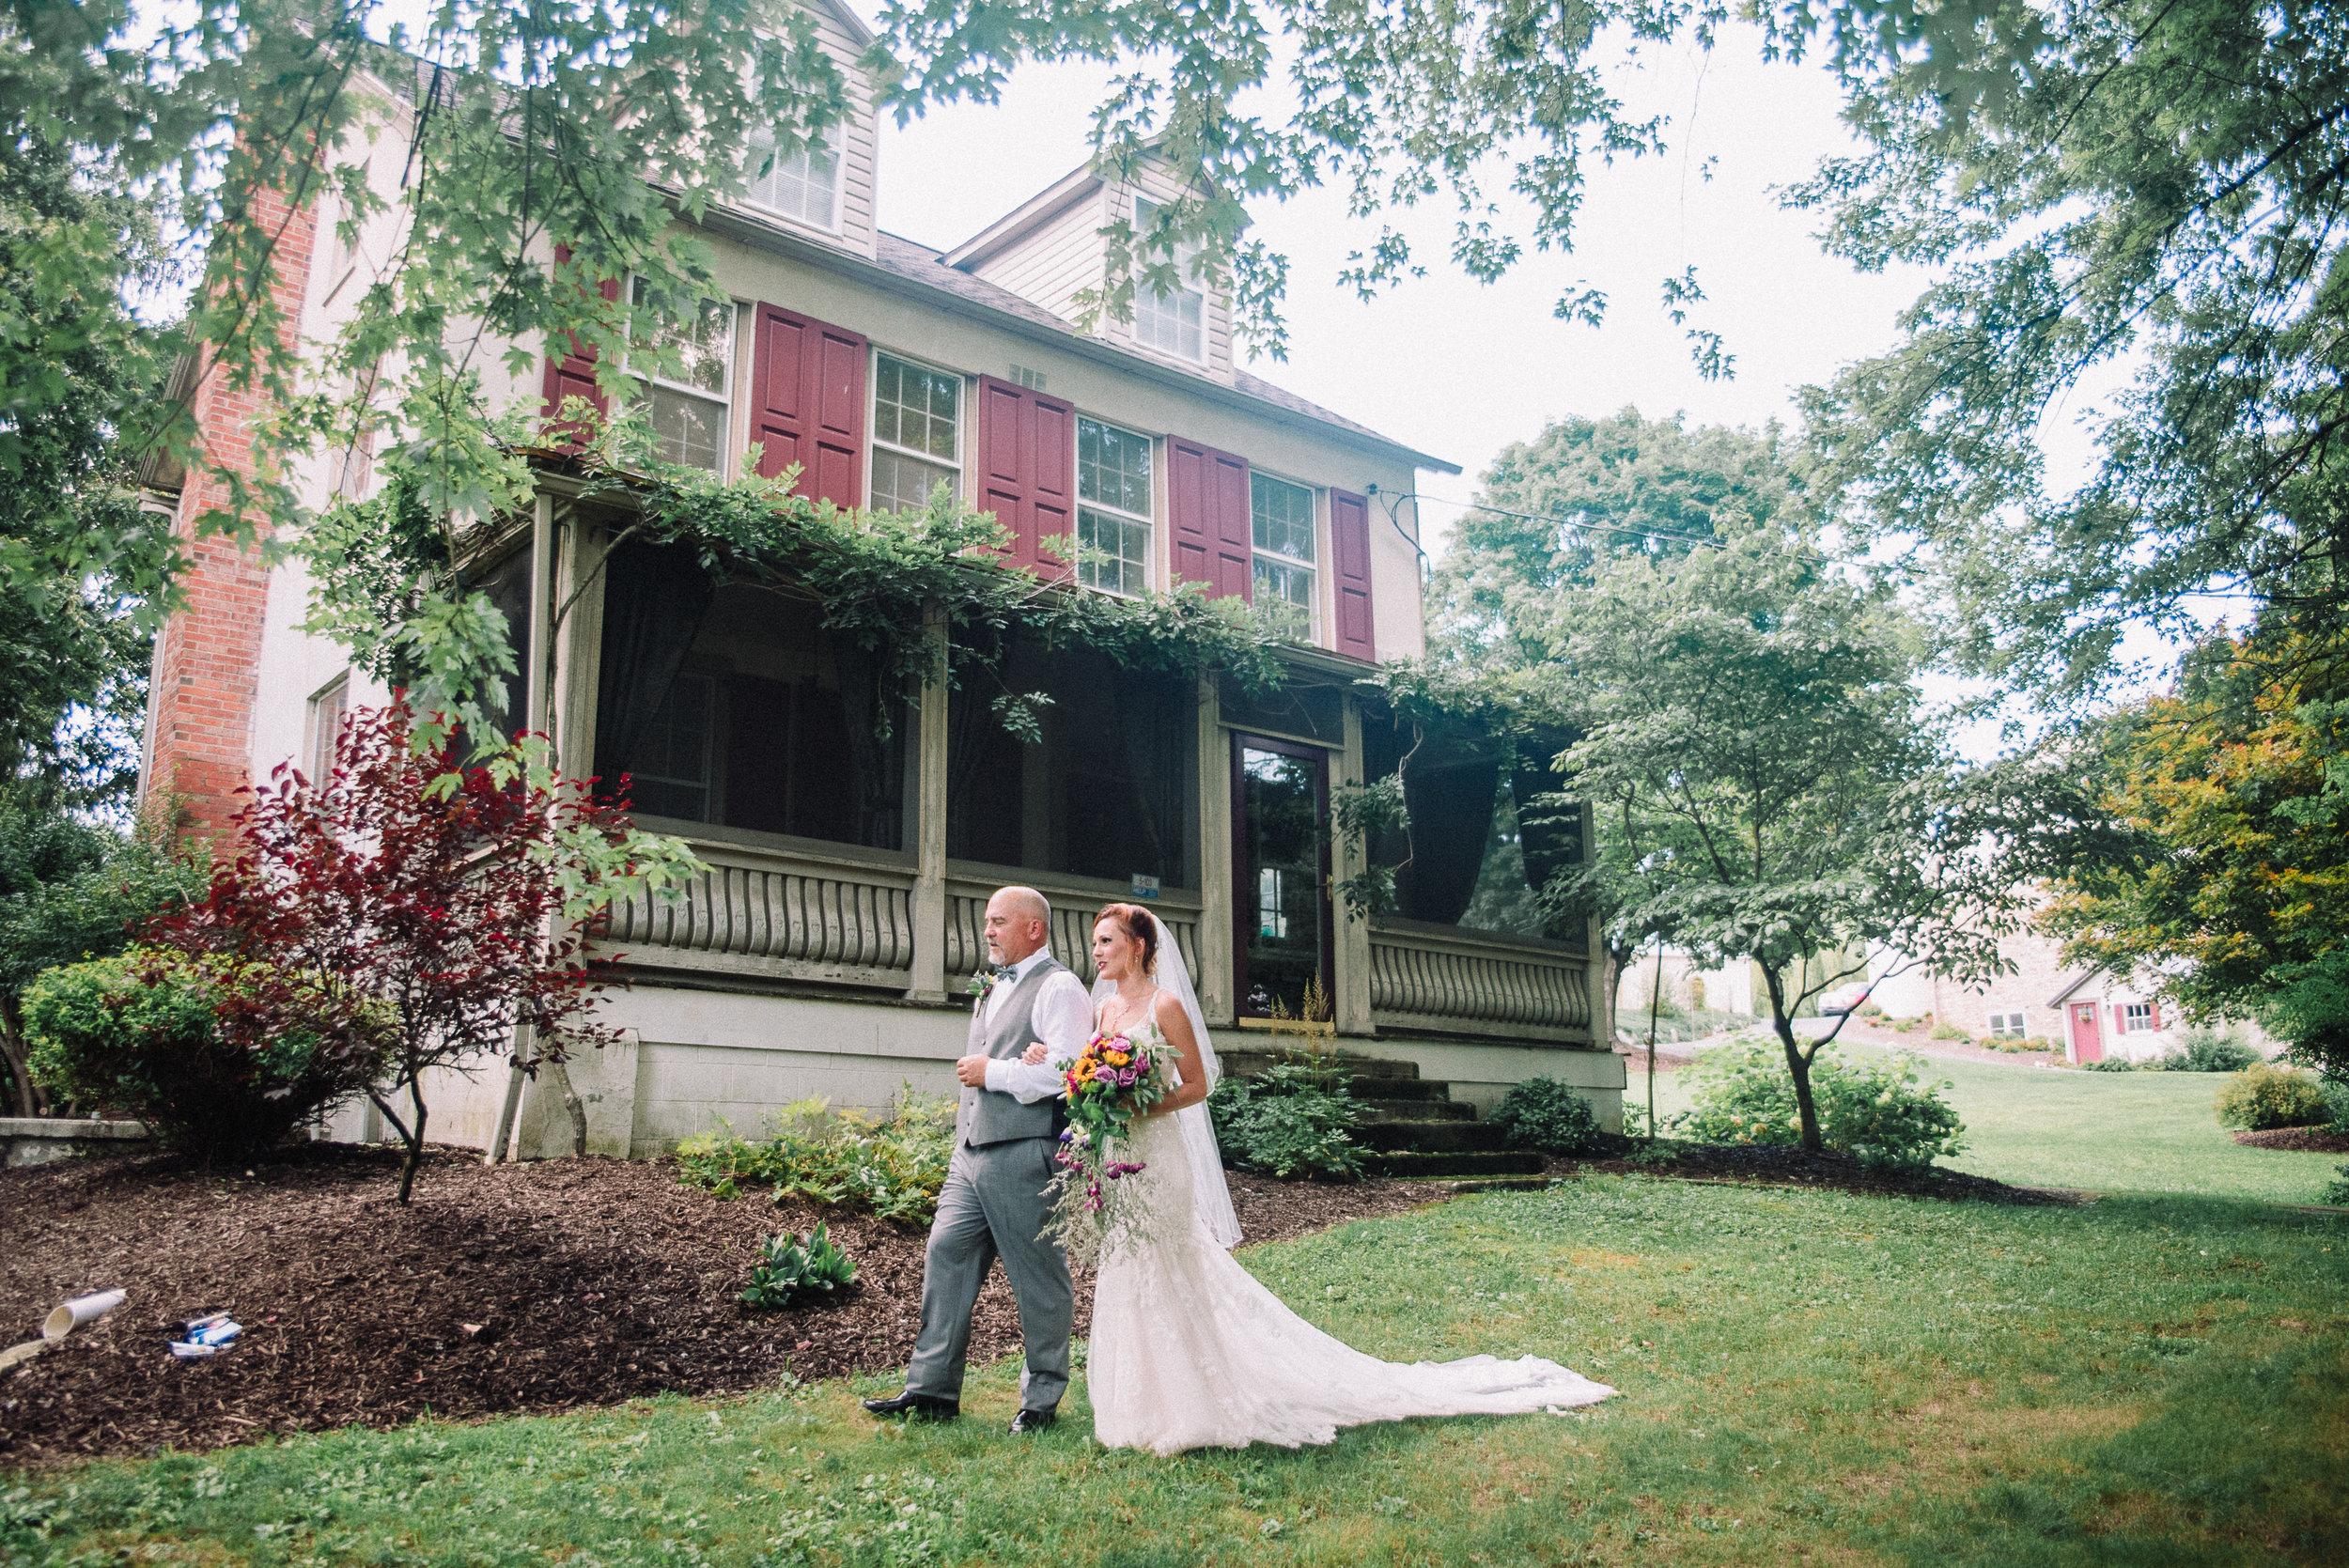 041ninalilyphoto-groveatkemptonwedding-hicksblog.jpg